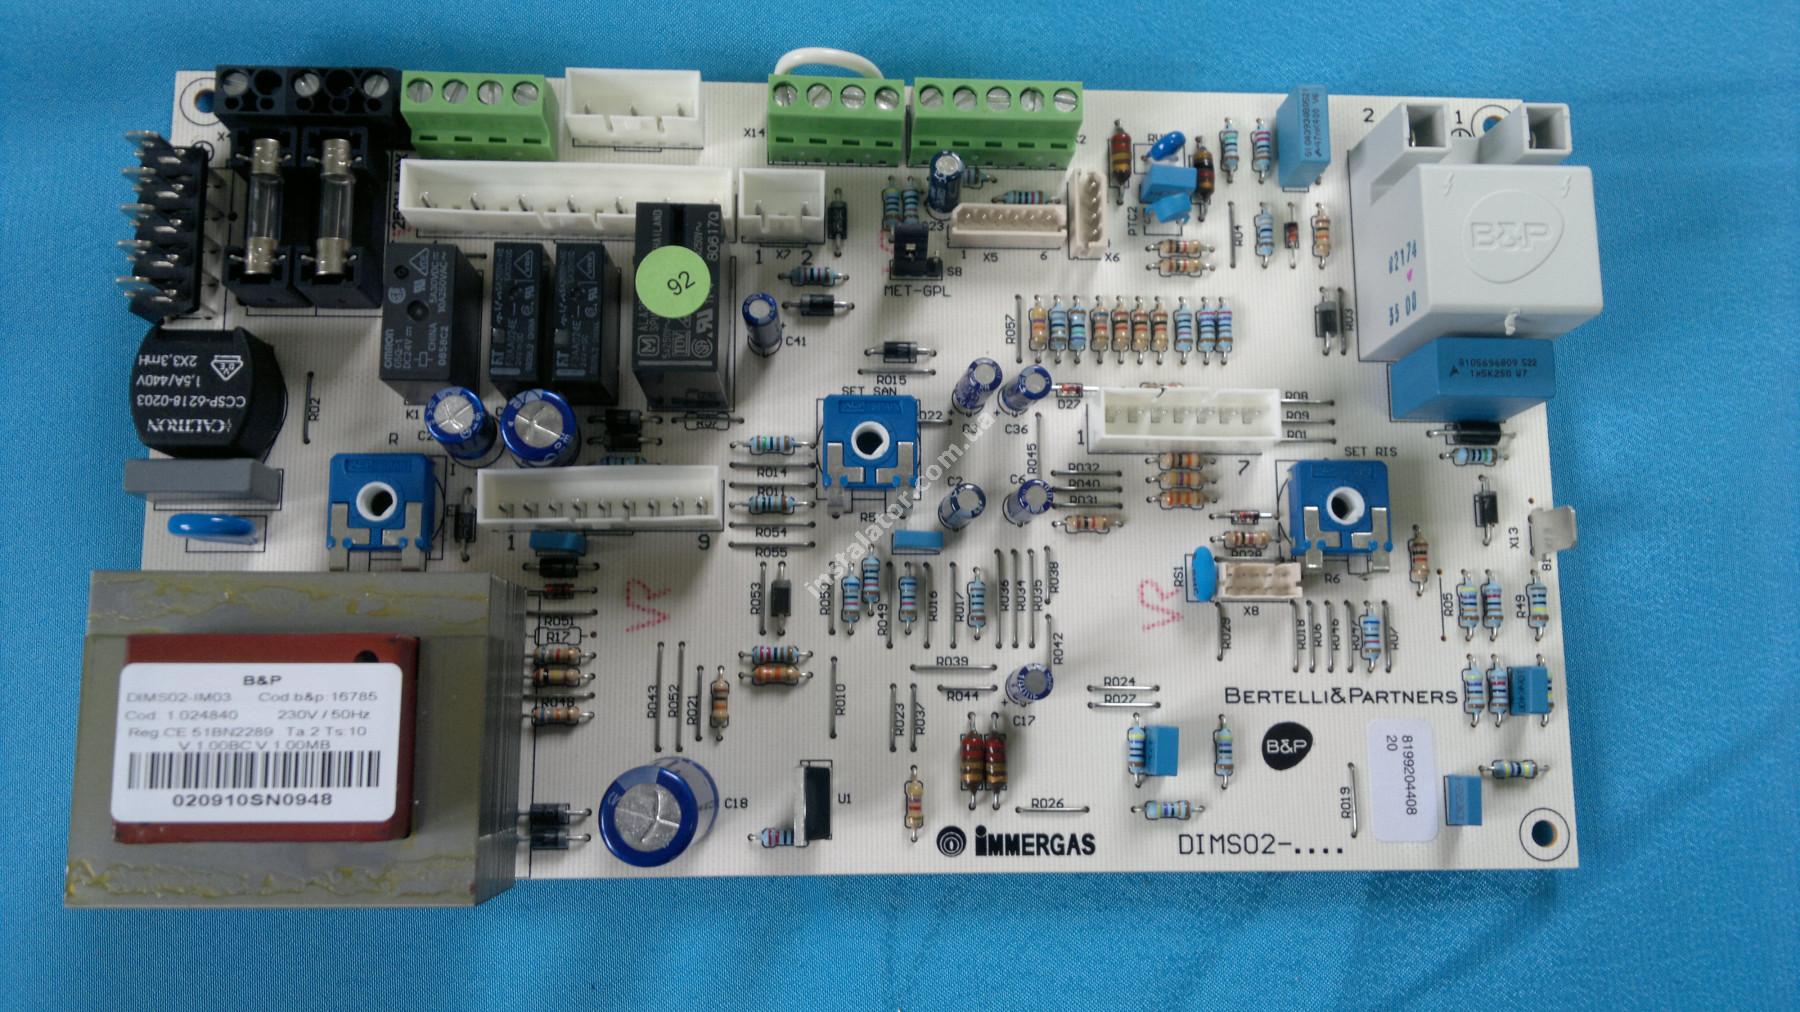 1.031865 Плата керування IMMERGAS Maior kw full-image-0